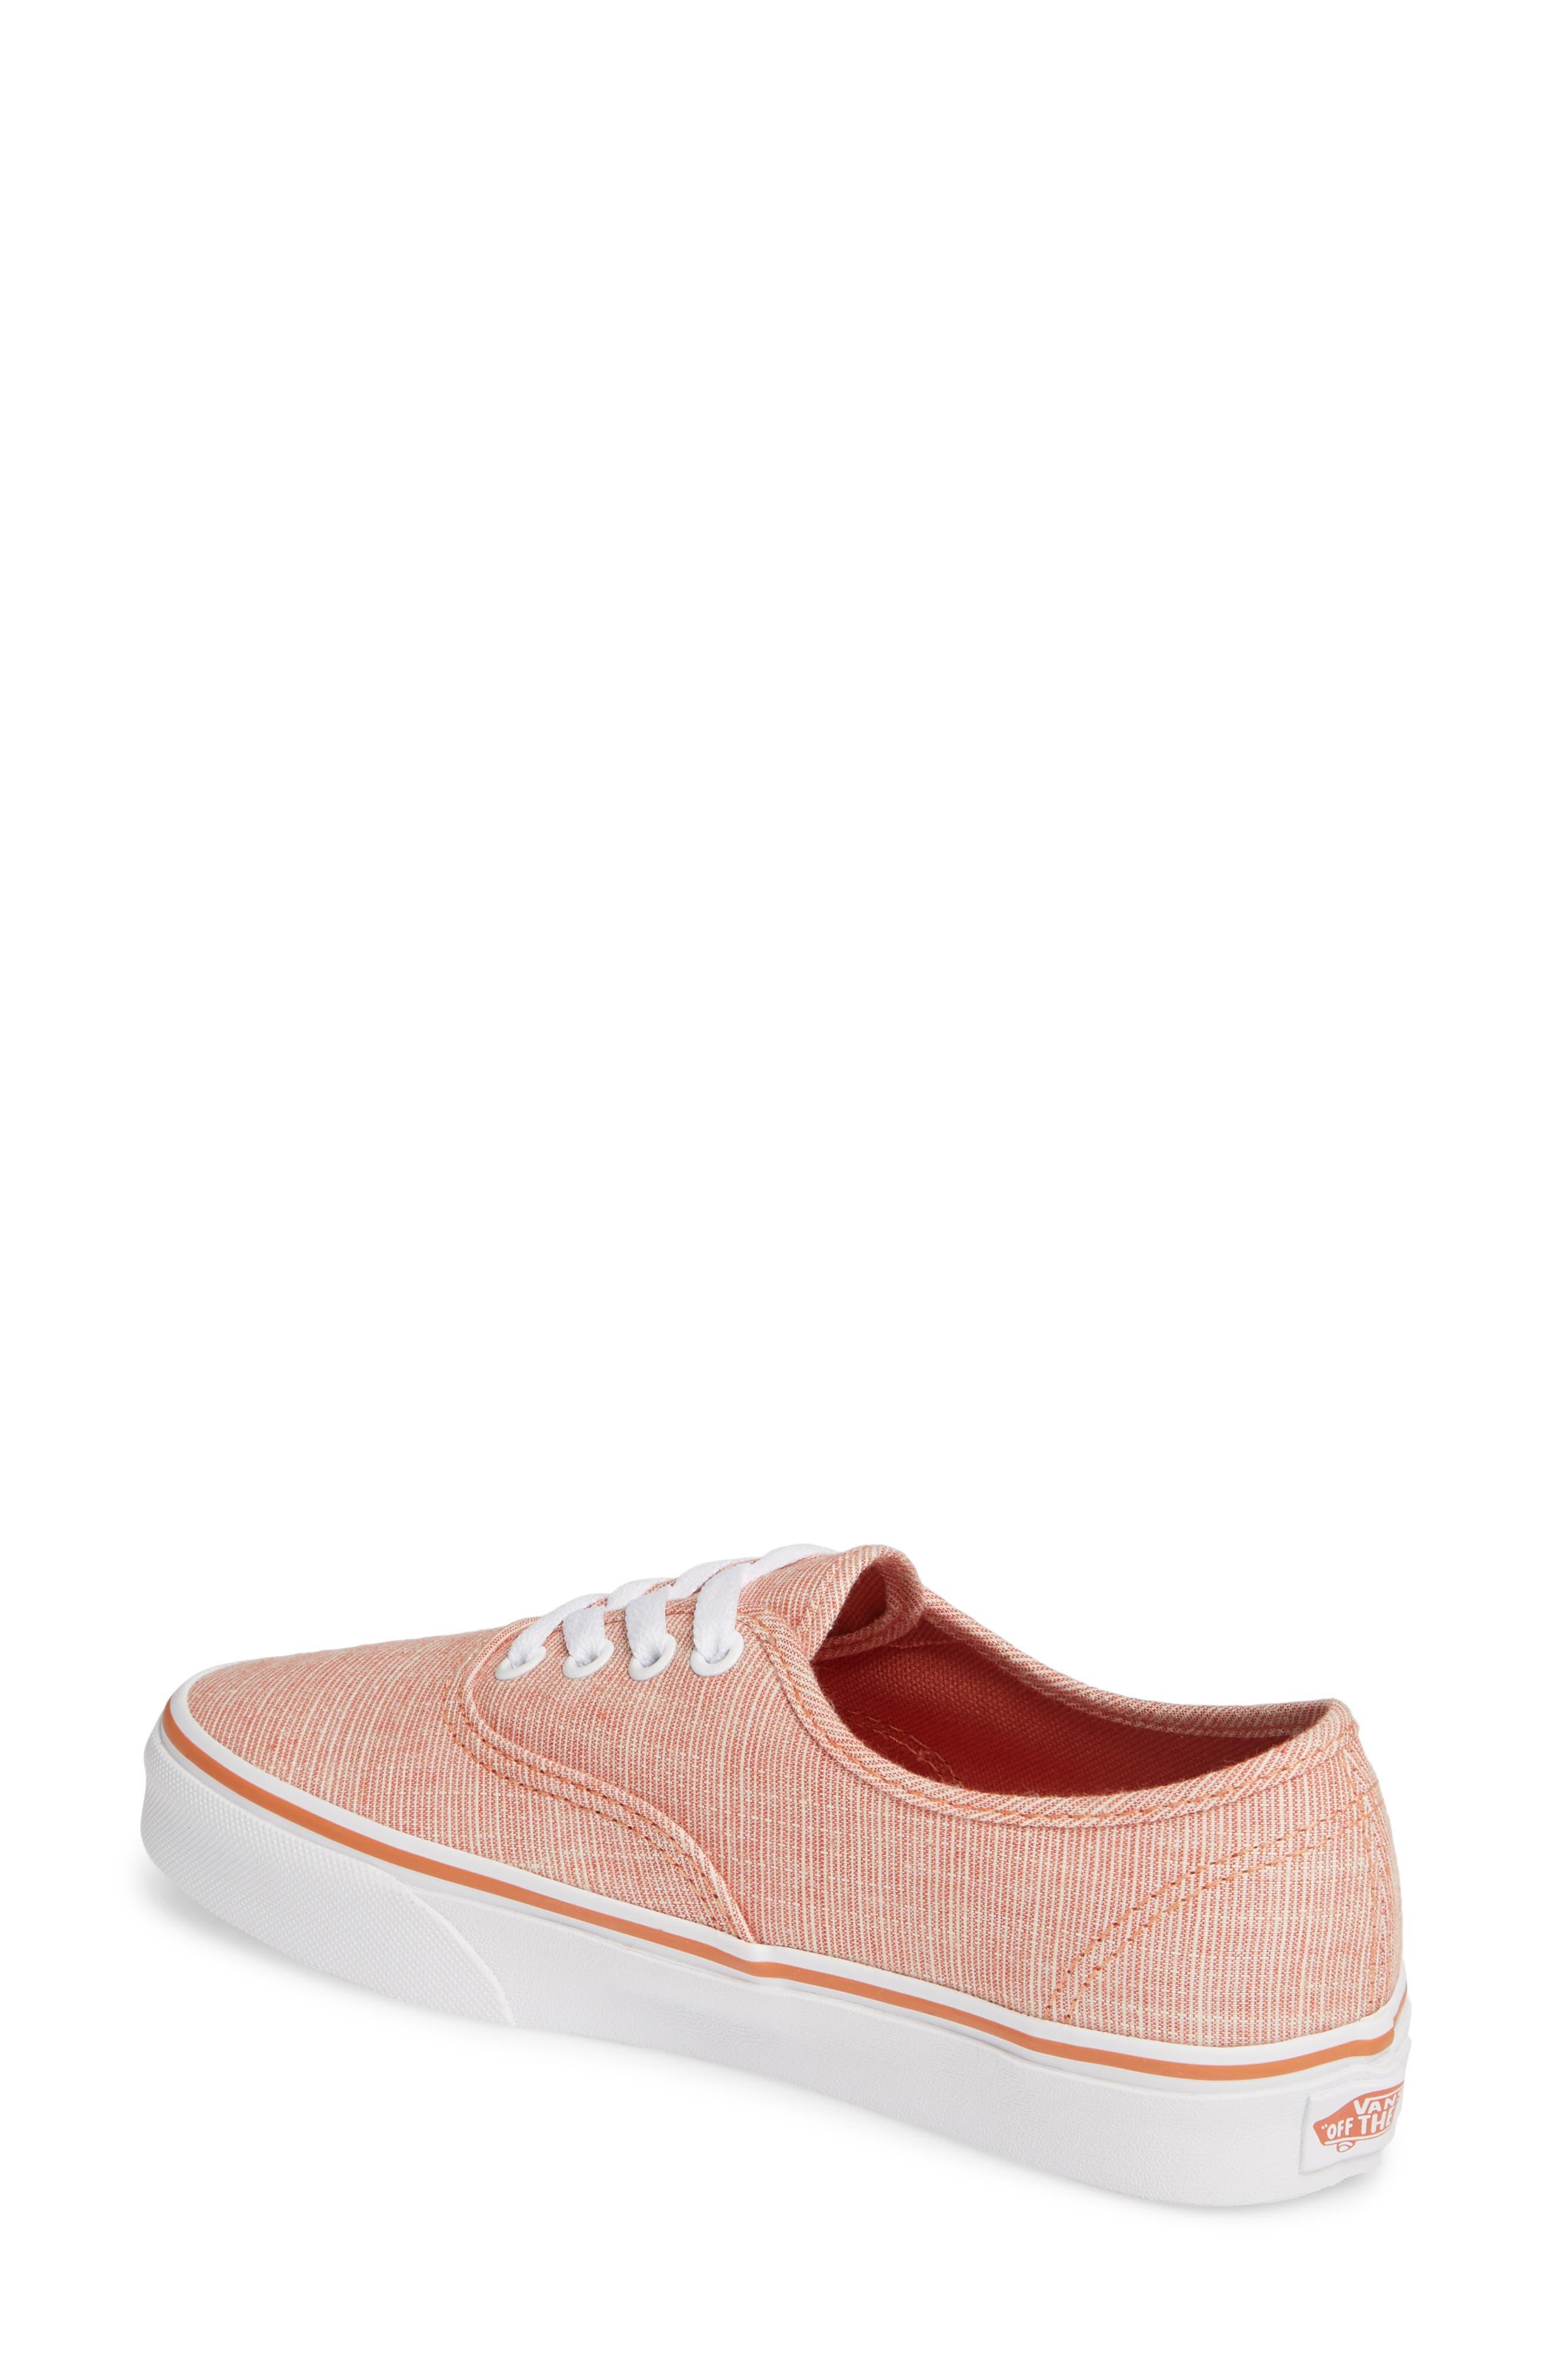 ,                             'Authentic' Sneaker,                             Alternate thumbnail 374, color,                             602